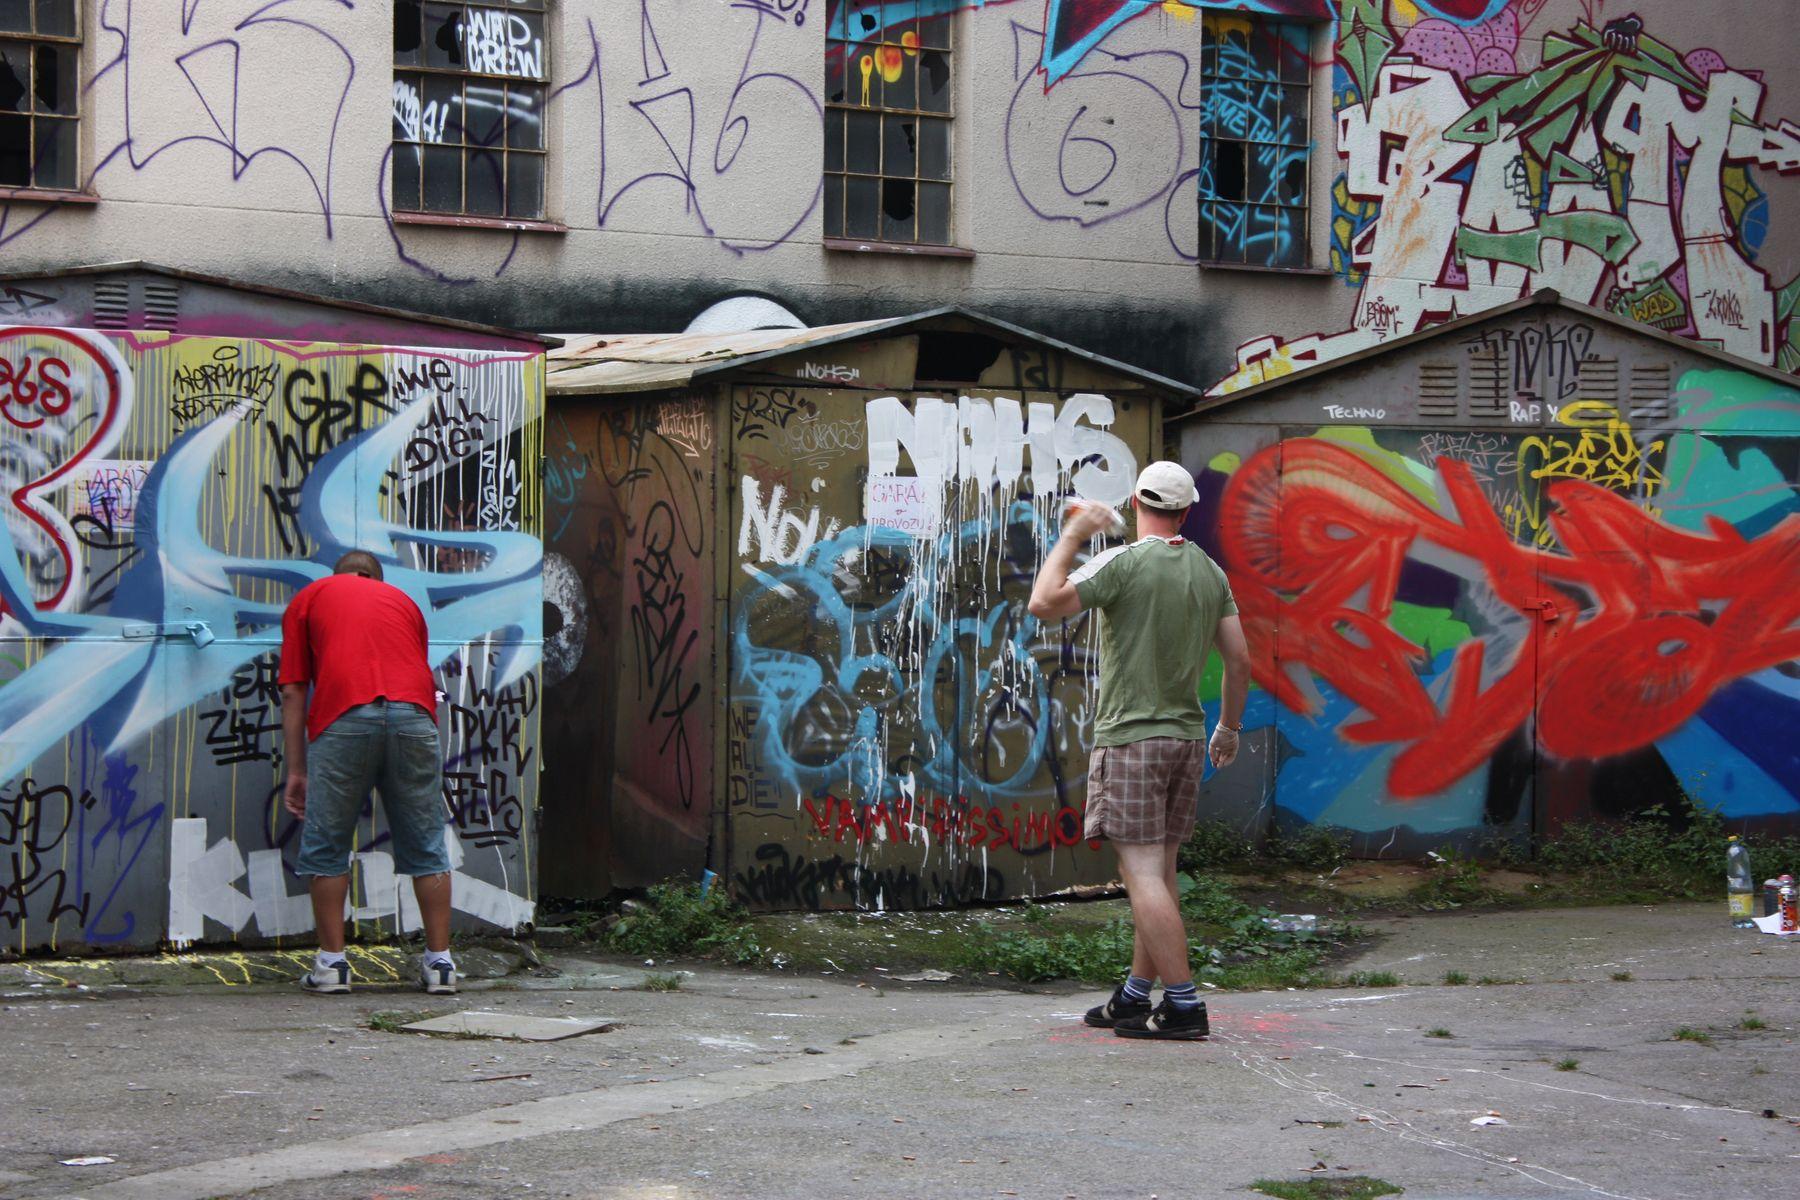 El Graffiti Arte O Vandalismo Radio Praga - Graffitis-en-casa